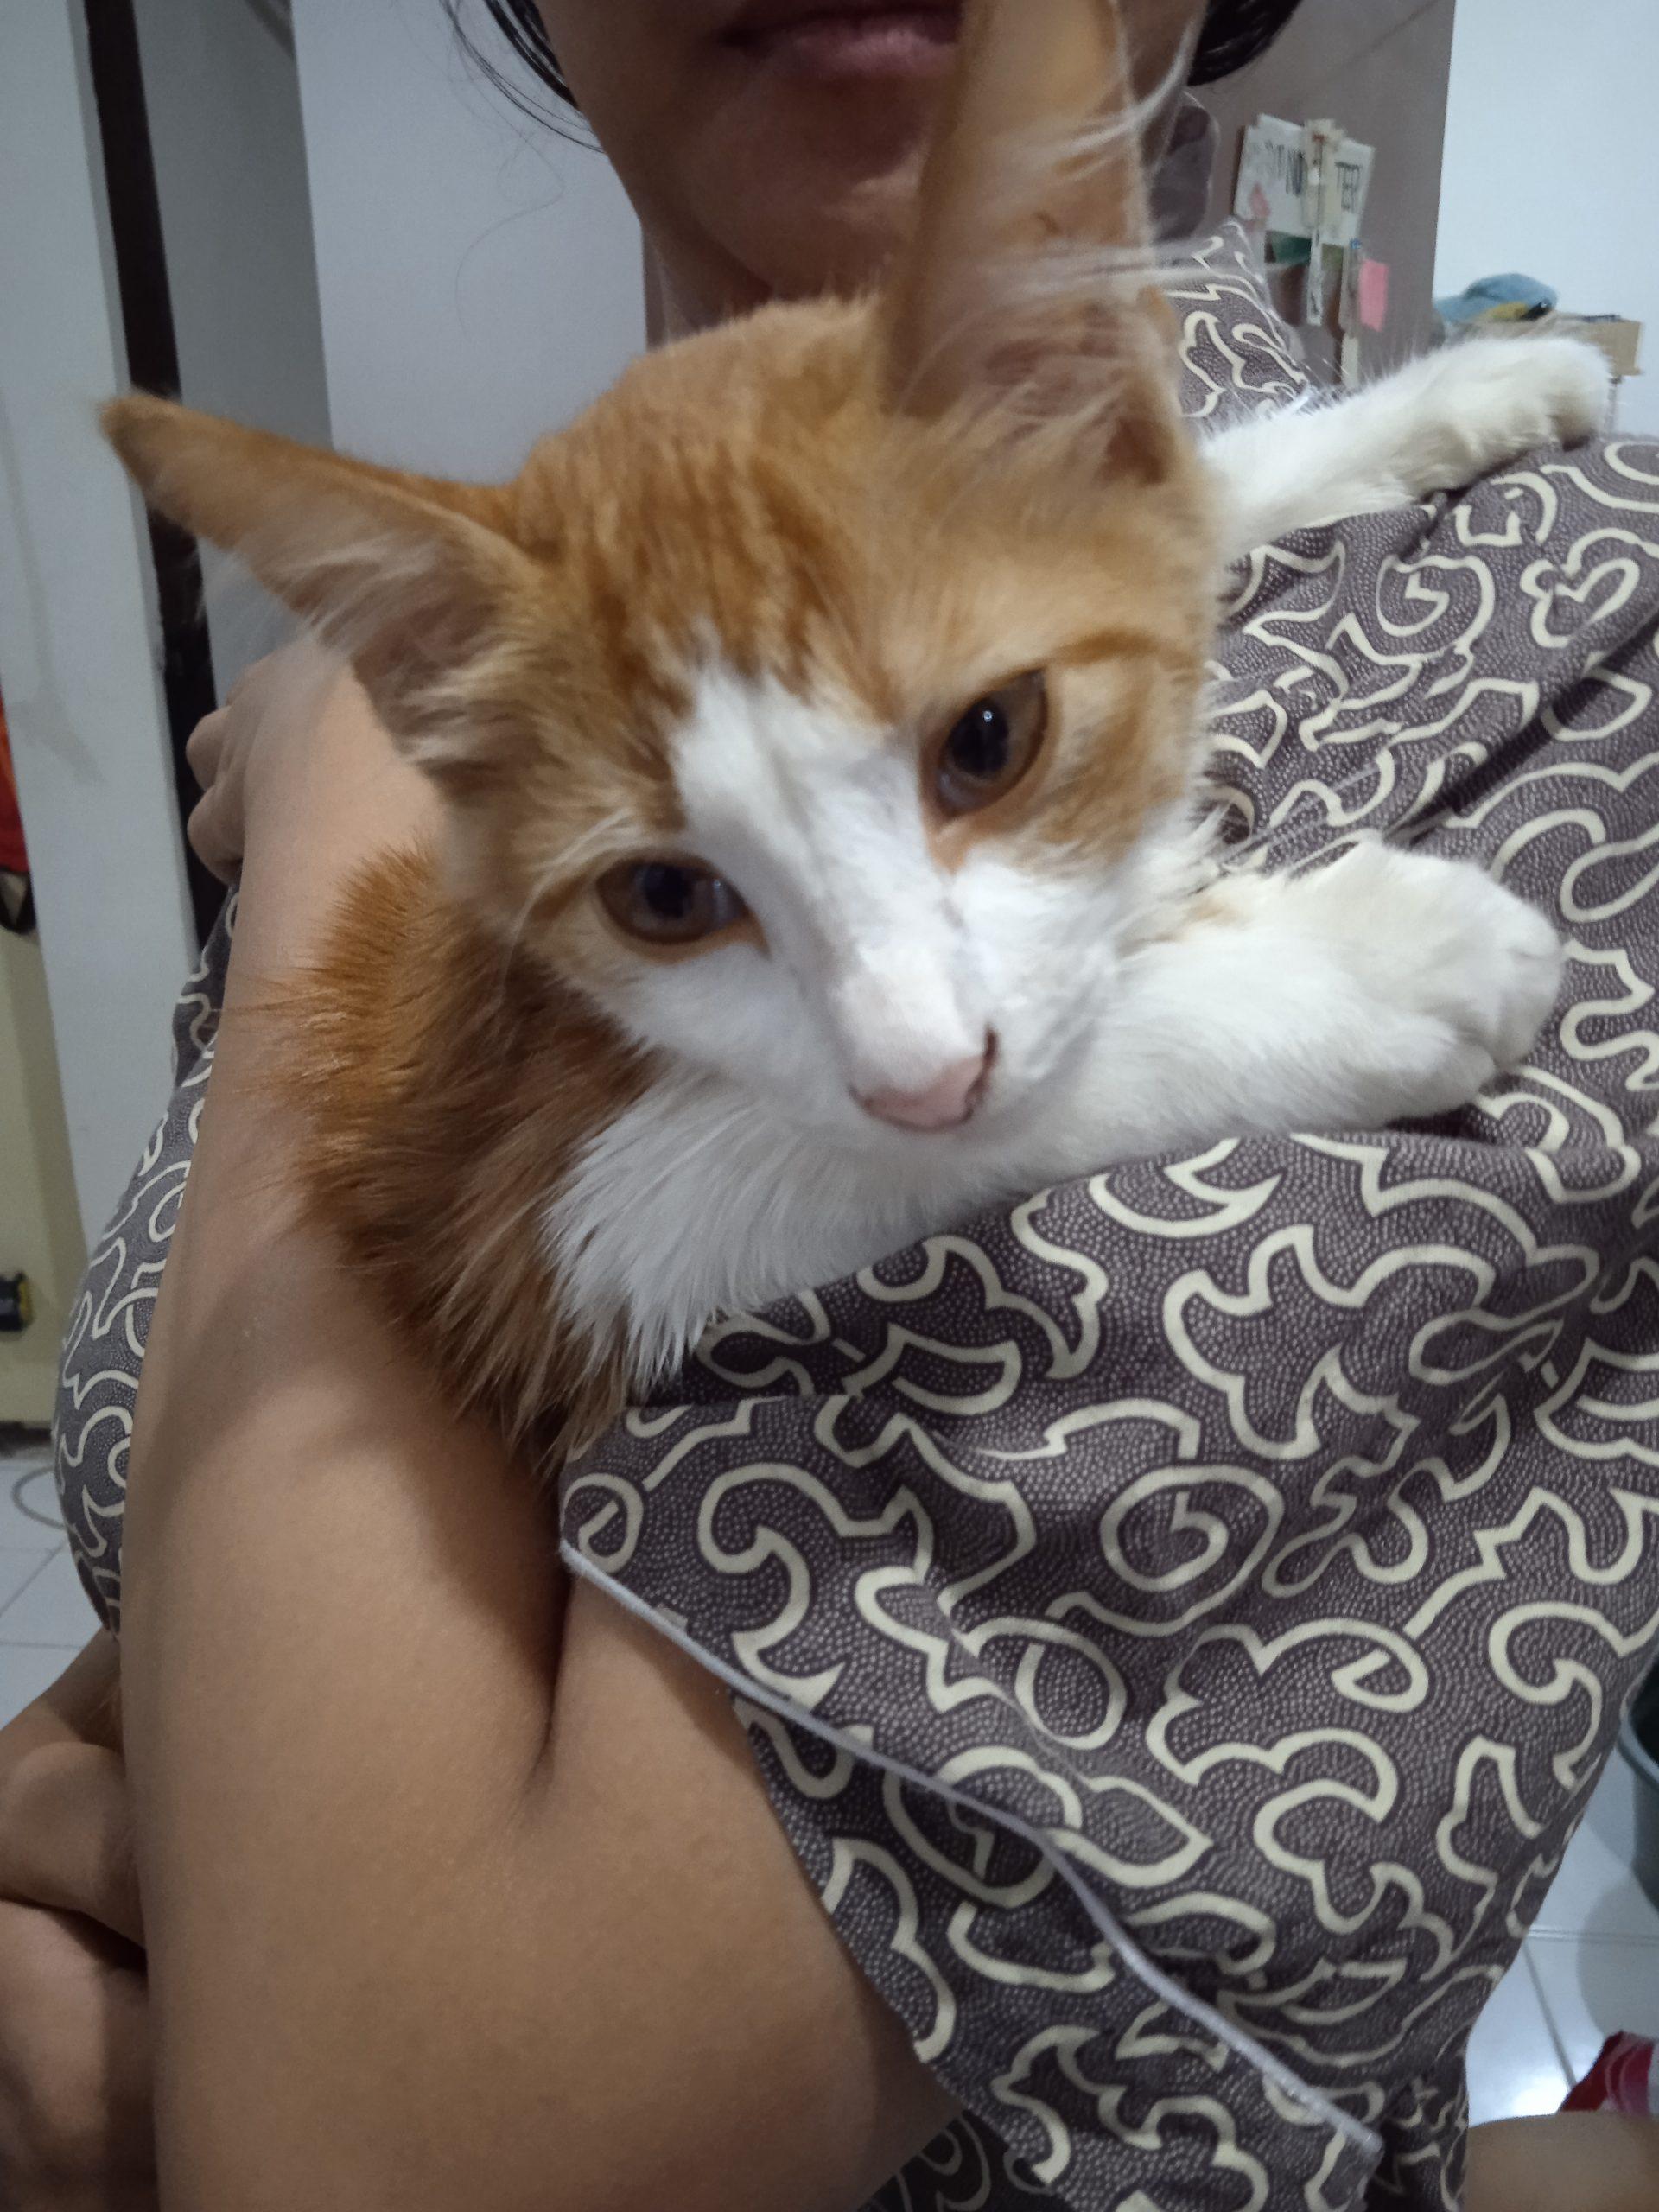 mayooo cat spraying no more